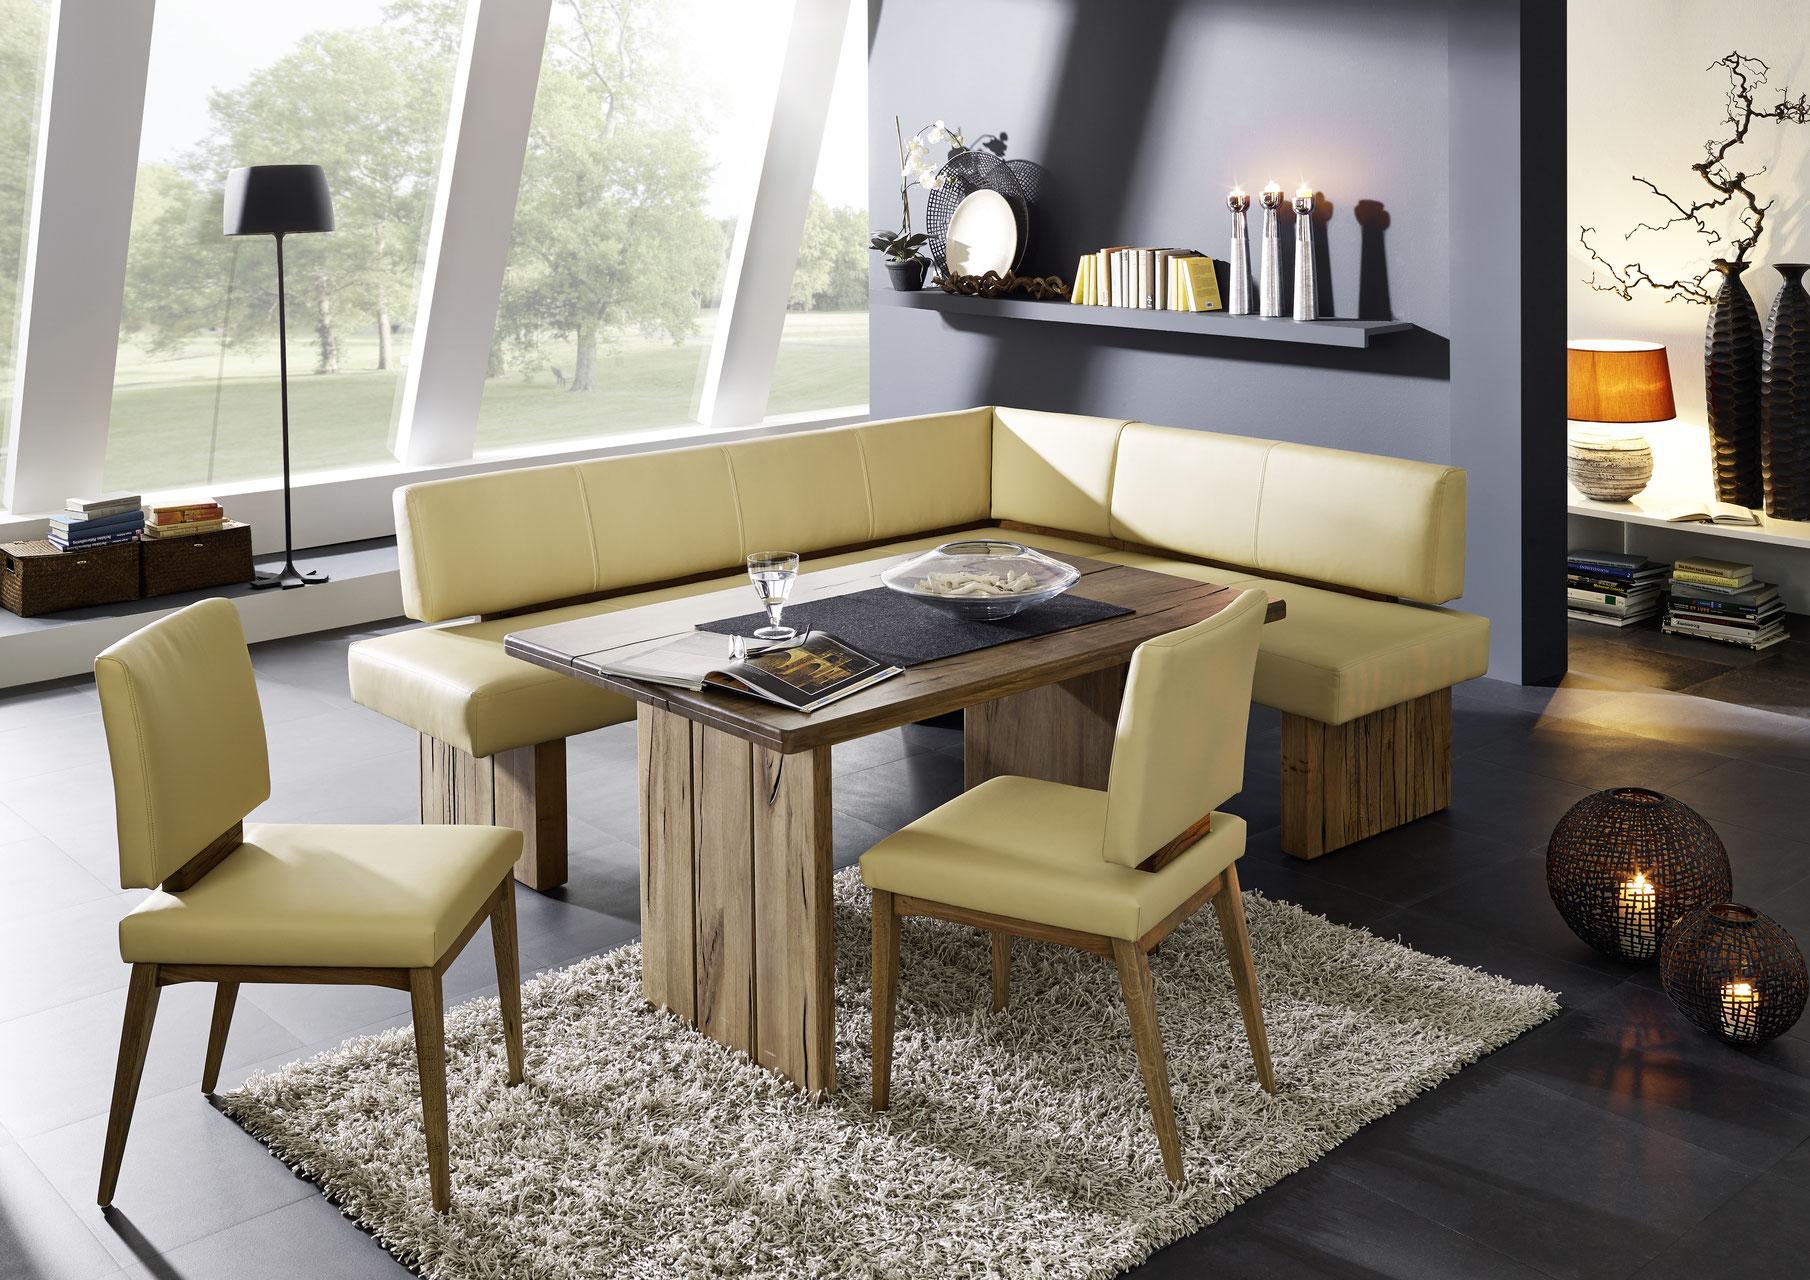 Eckbank massivholz nach maß  Edle Eckbank Echtleder - Naturnah Möbel - Moderne Massivholzmöbel